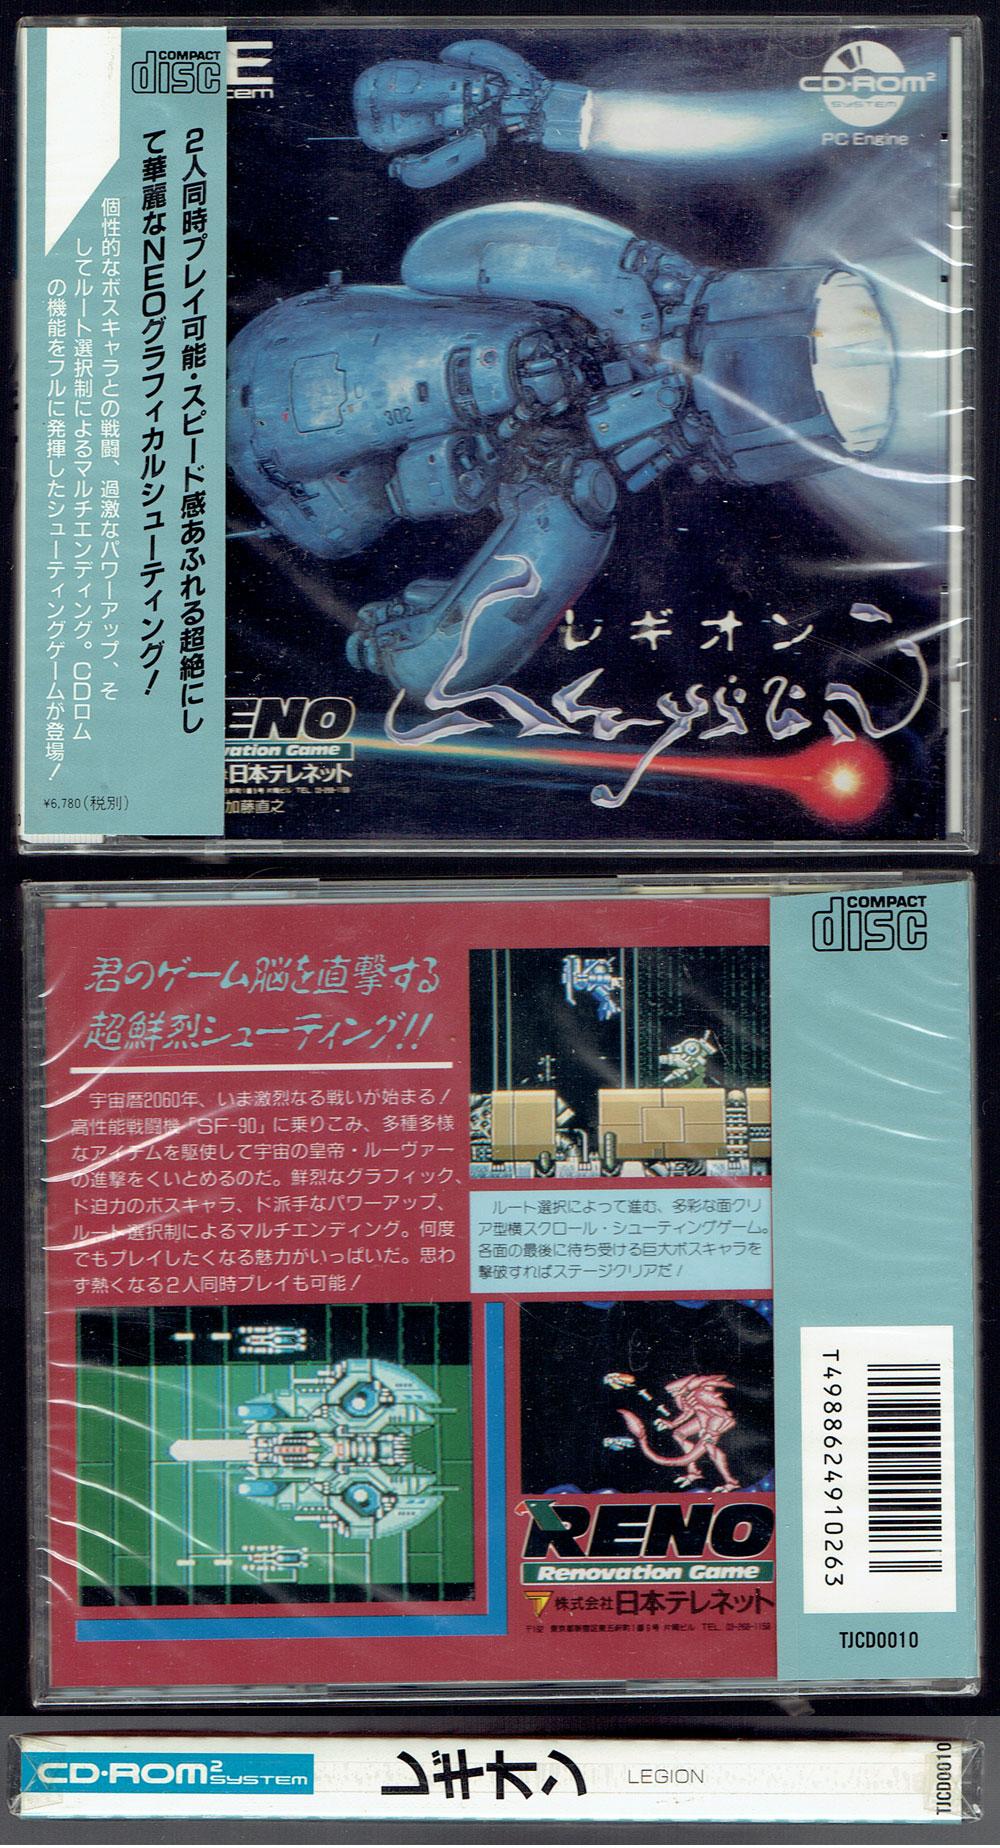 Legion (New) from Reno - PC Engine CD ROM